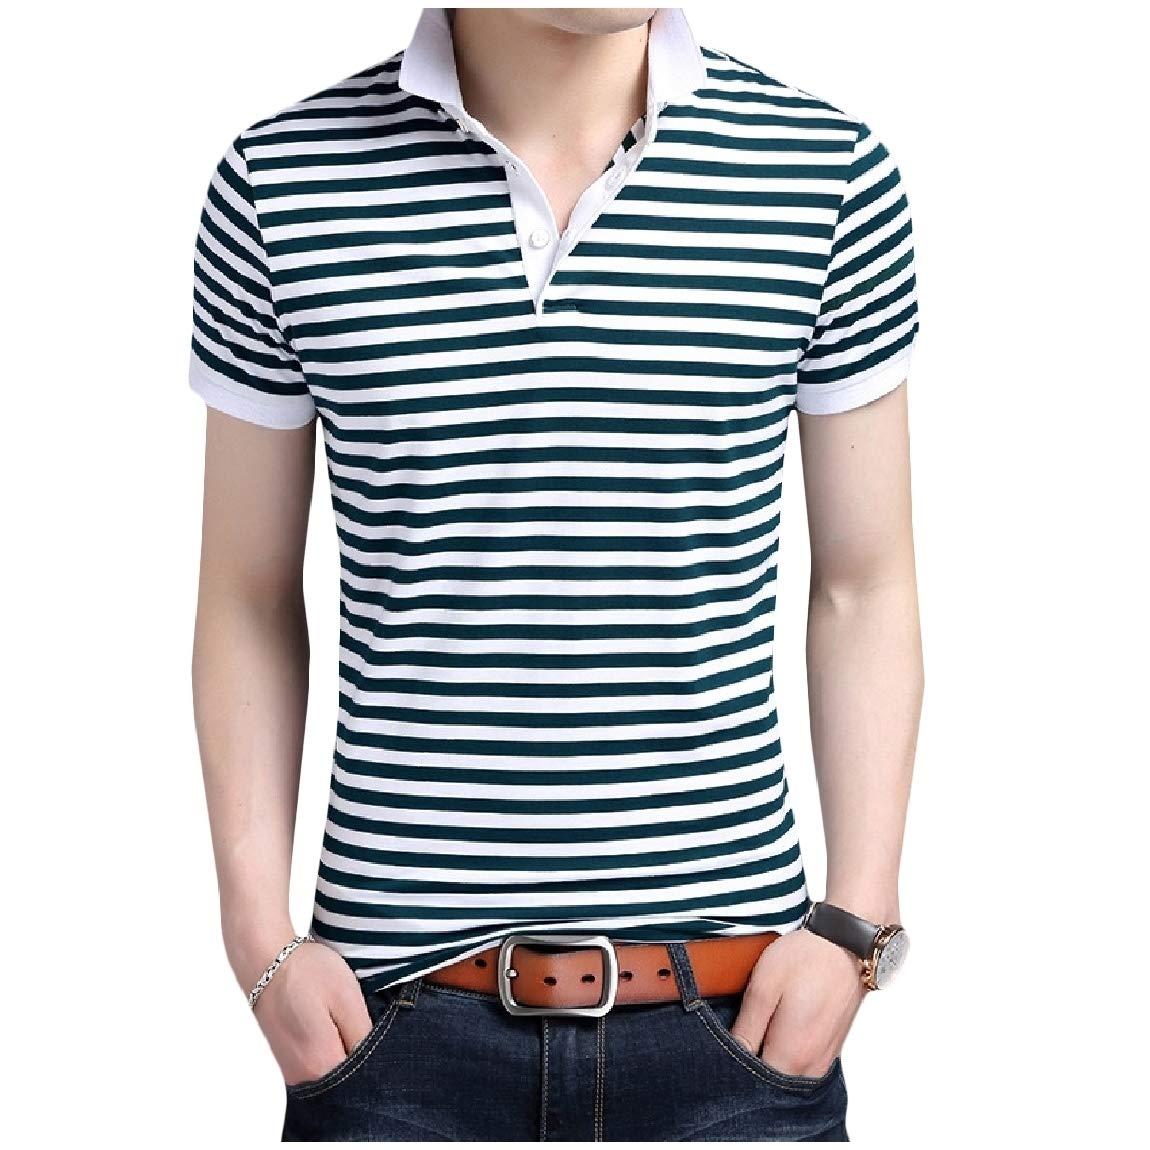 Mfasica Mens Striped Plus Size Lapel Stitch Short-Sleeve Cotton Tees Top